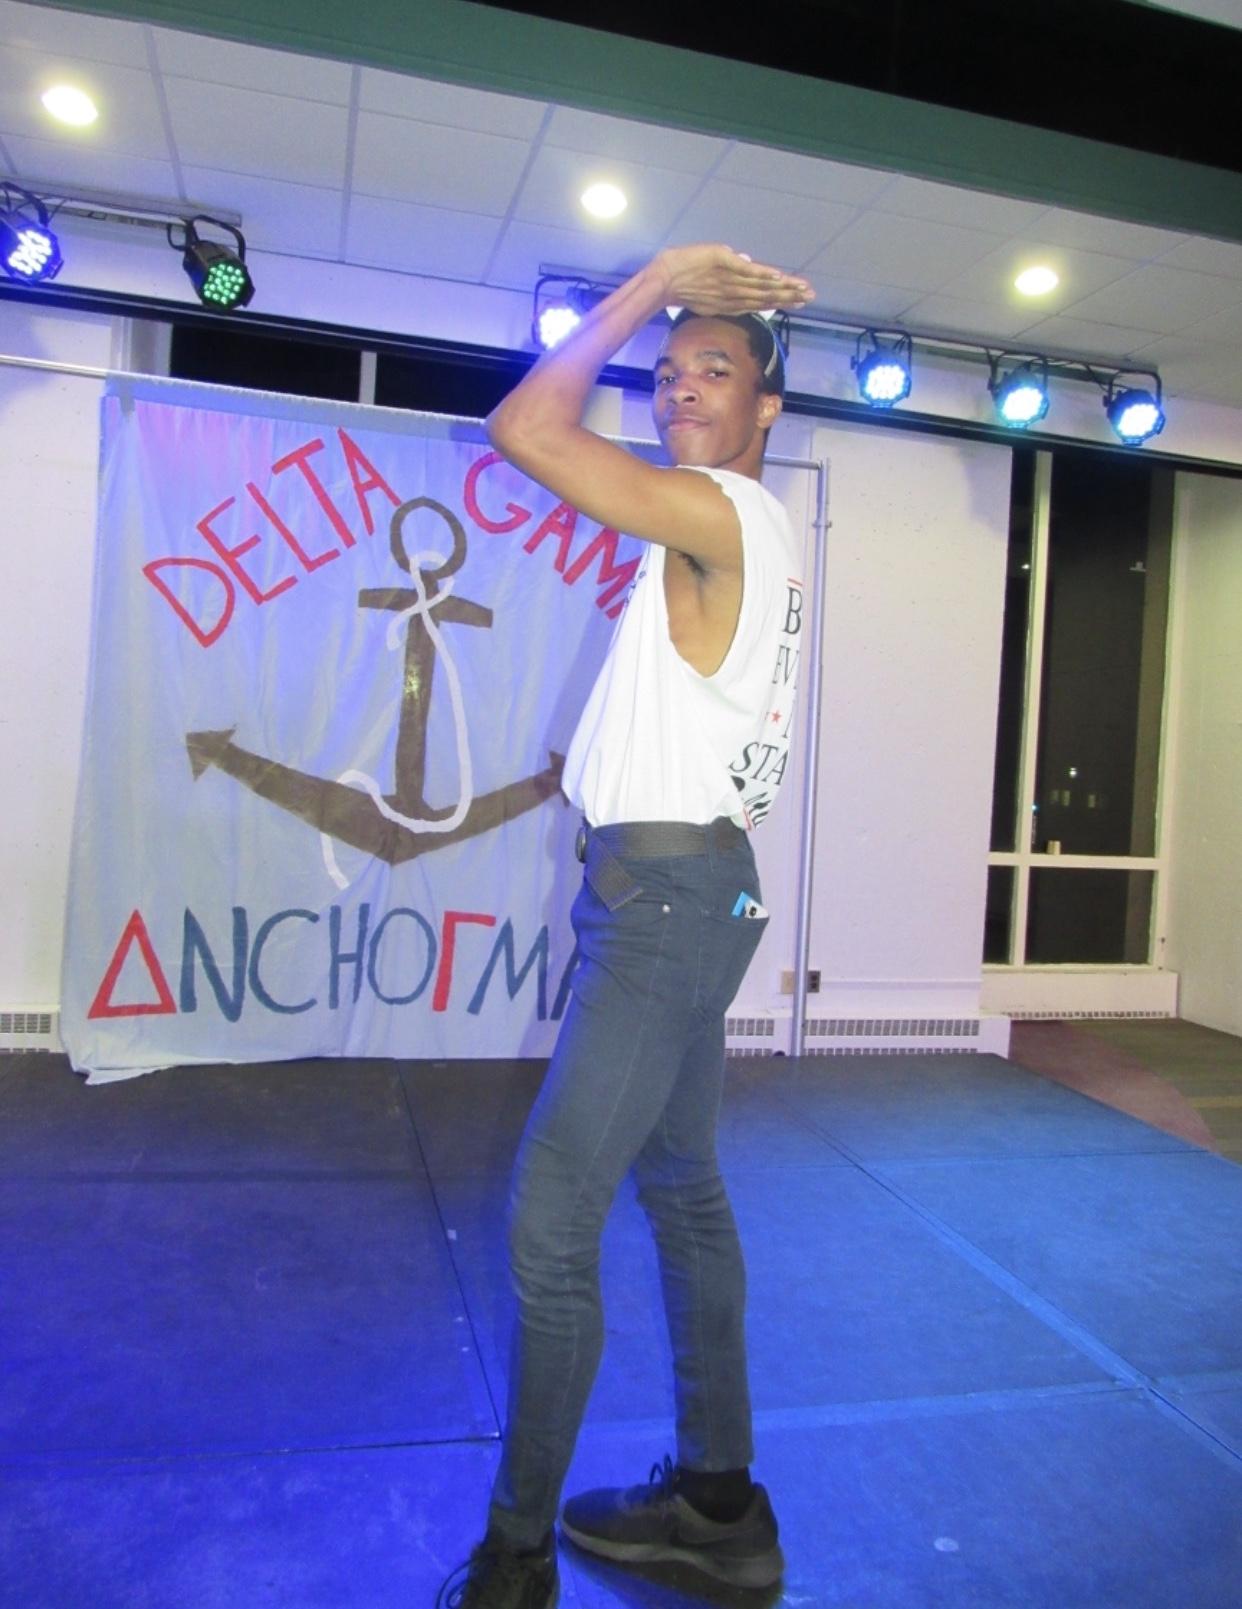 Anchorman 2019